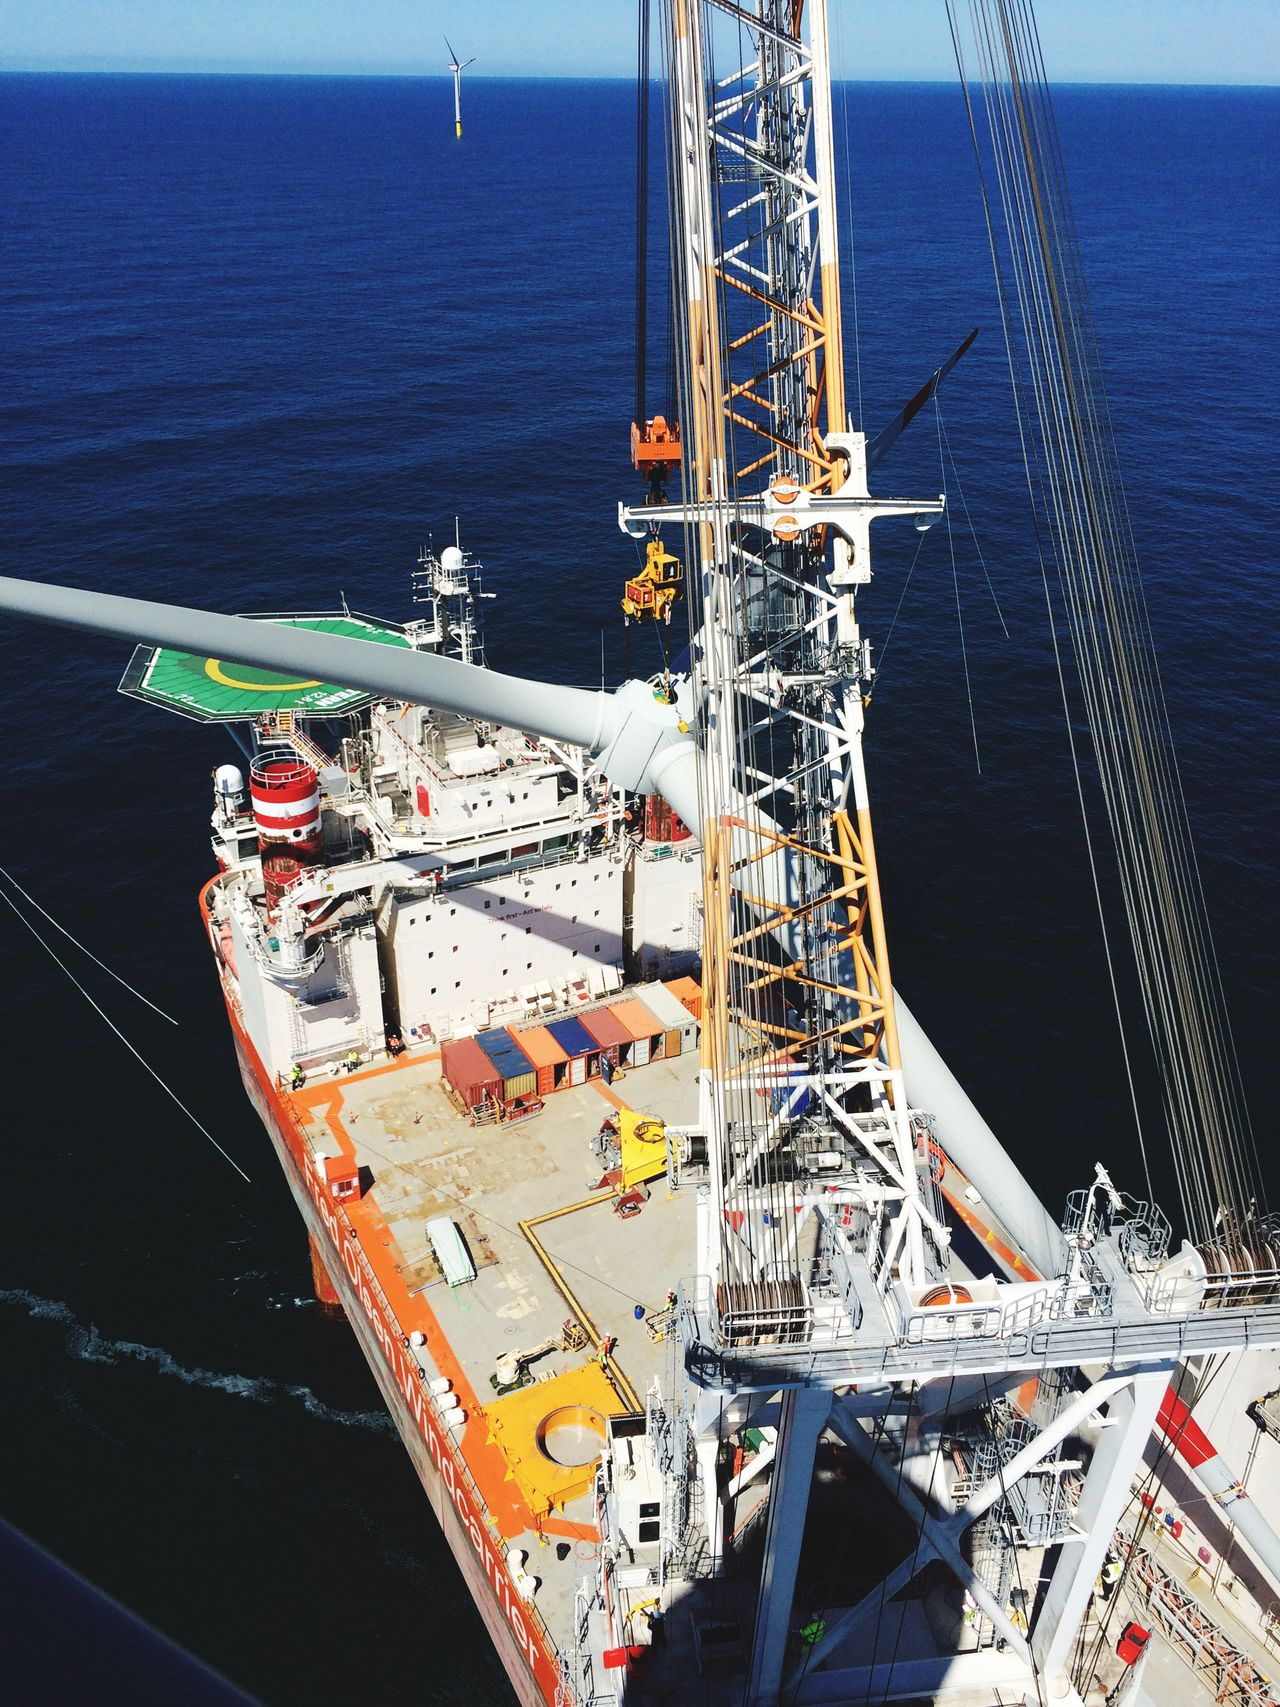 Work Nautical Vessel High Angle View Outdoors Water Sailing Wind Windturbines Jackup Crane Renewable Energy Construction